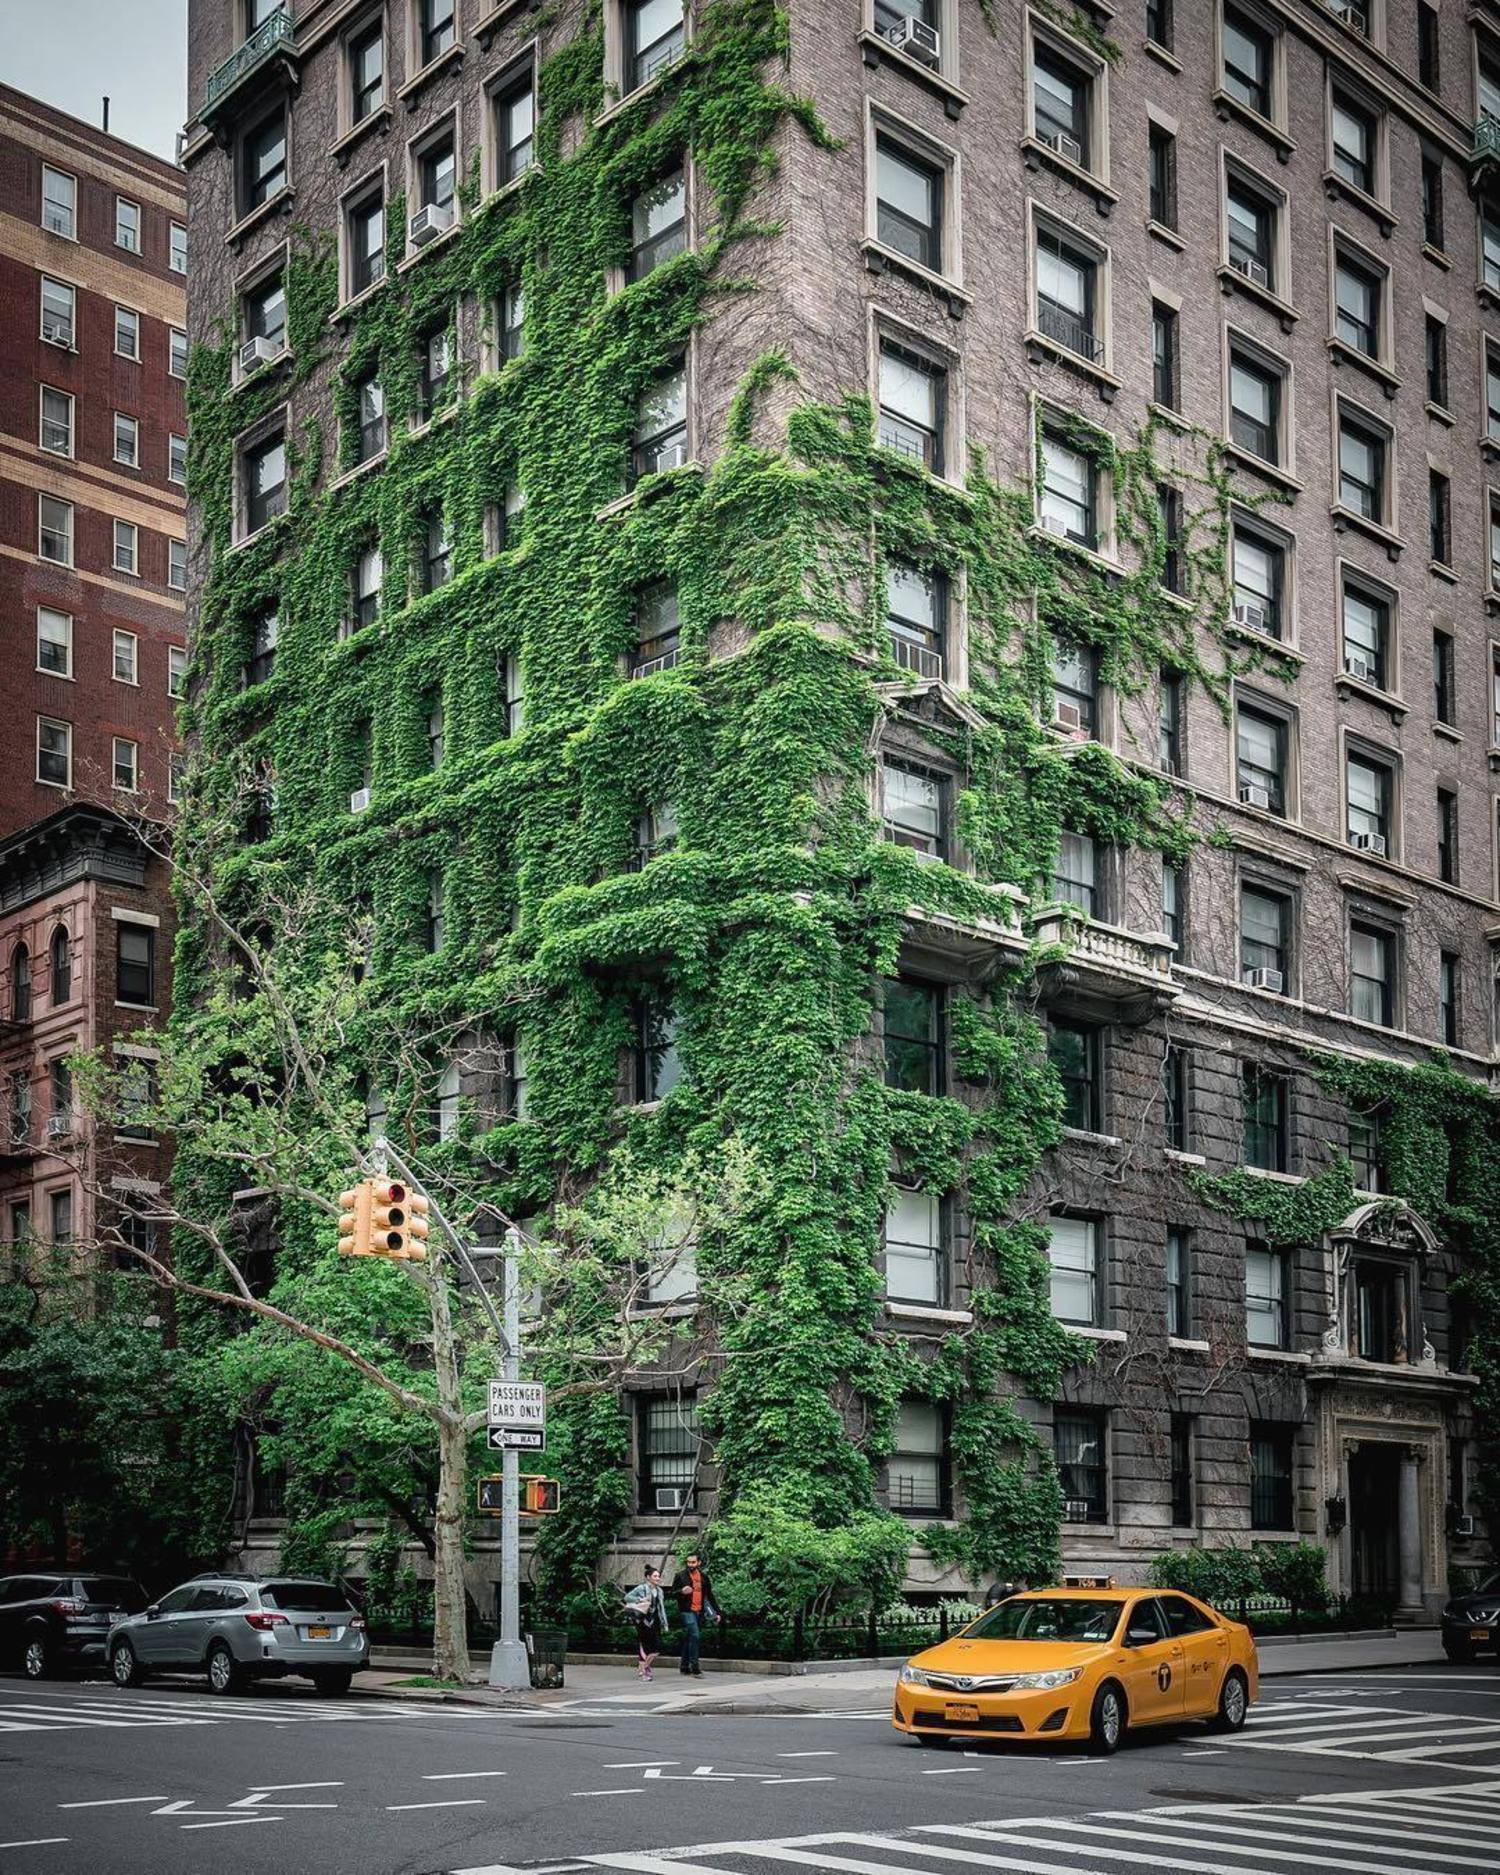 New York, New York. Photo via @212sid #viewingnyc #newyork #newyorkcity #nyc